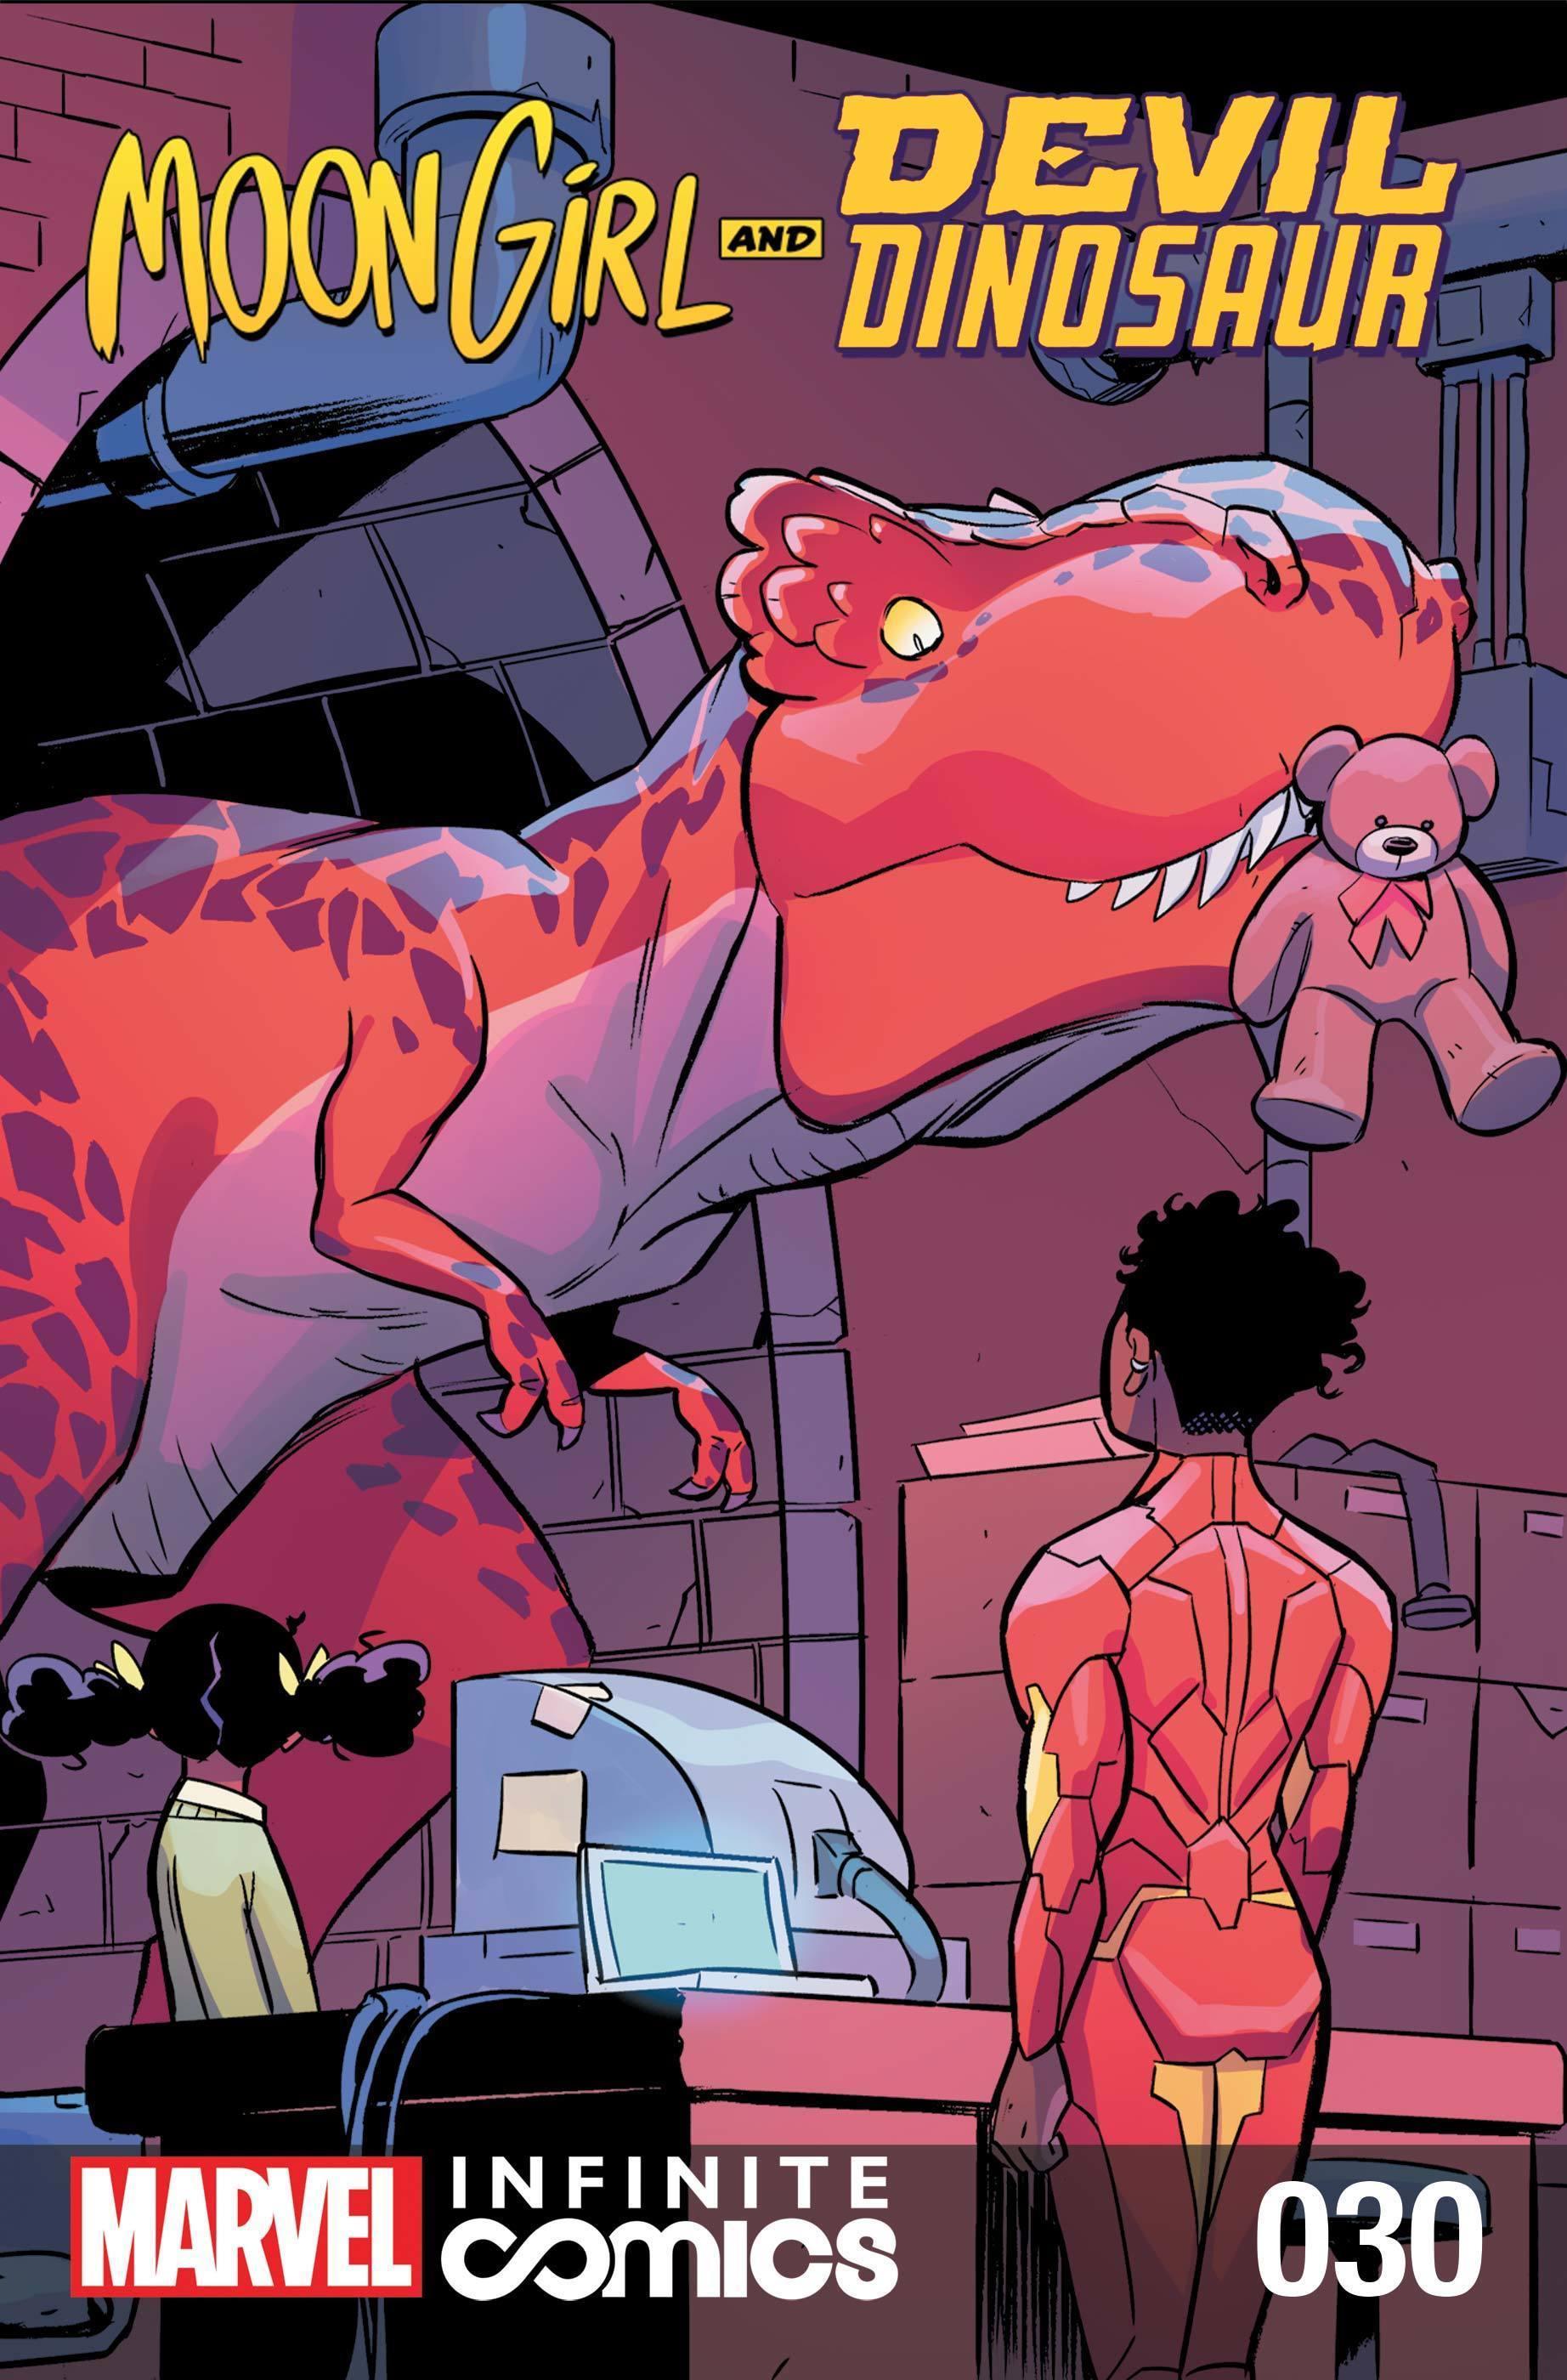 Moon Girl and Devil Dinosaur #30